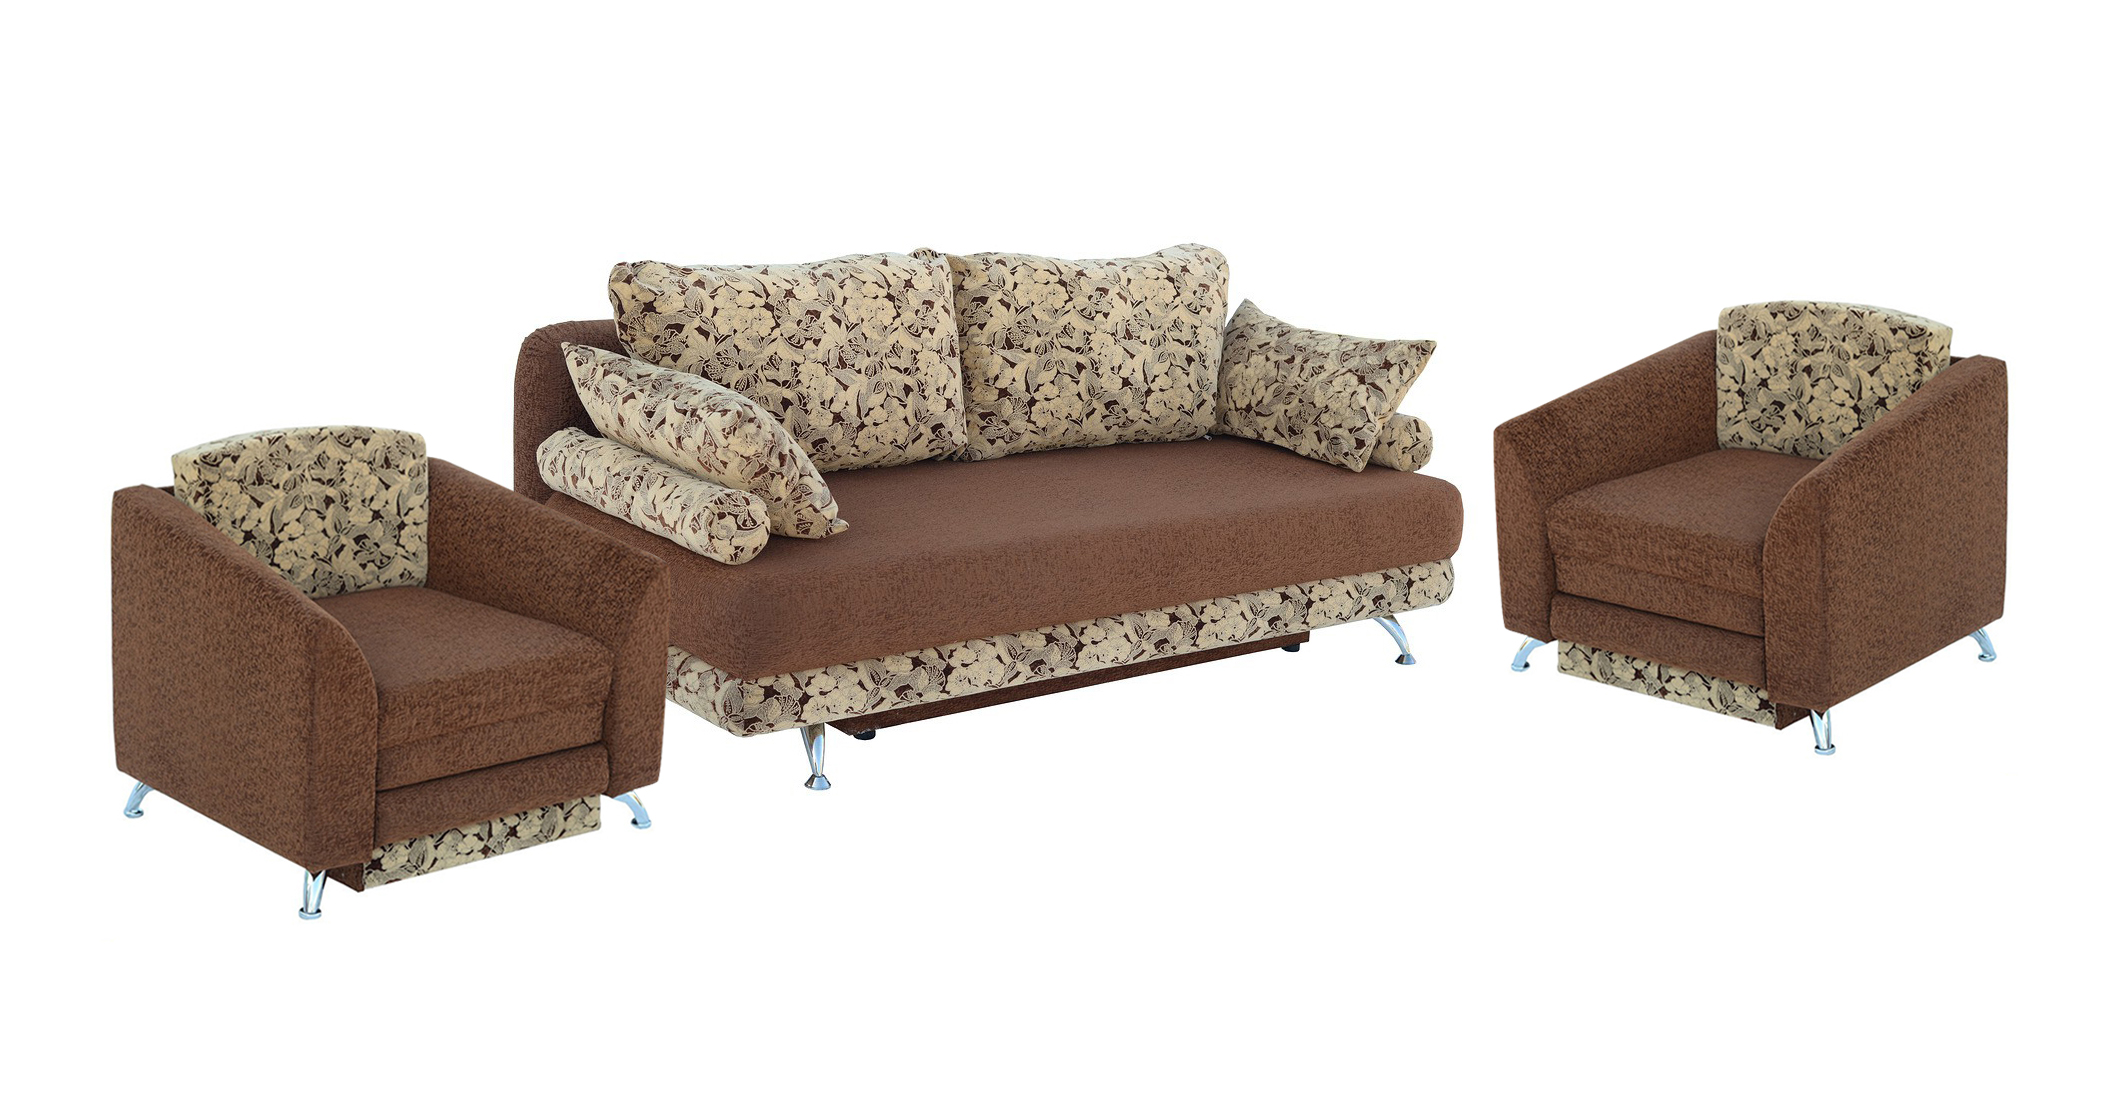 Комплект мягкой мебели Стрит 3+1+1 Утин Размер: диван: 210х110 (сп.м. 163х210); кресло: 90х100 (сп.м. 60х190)